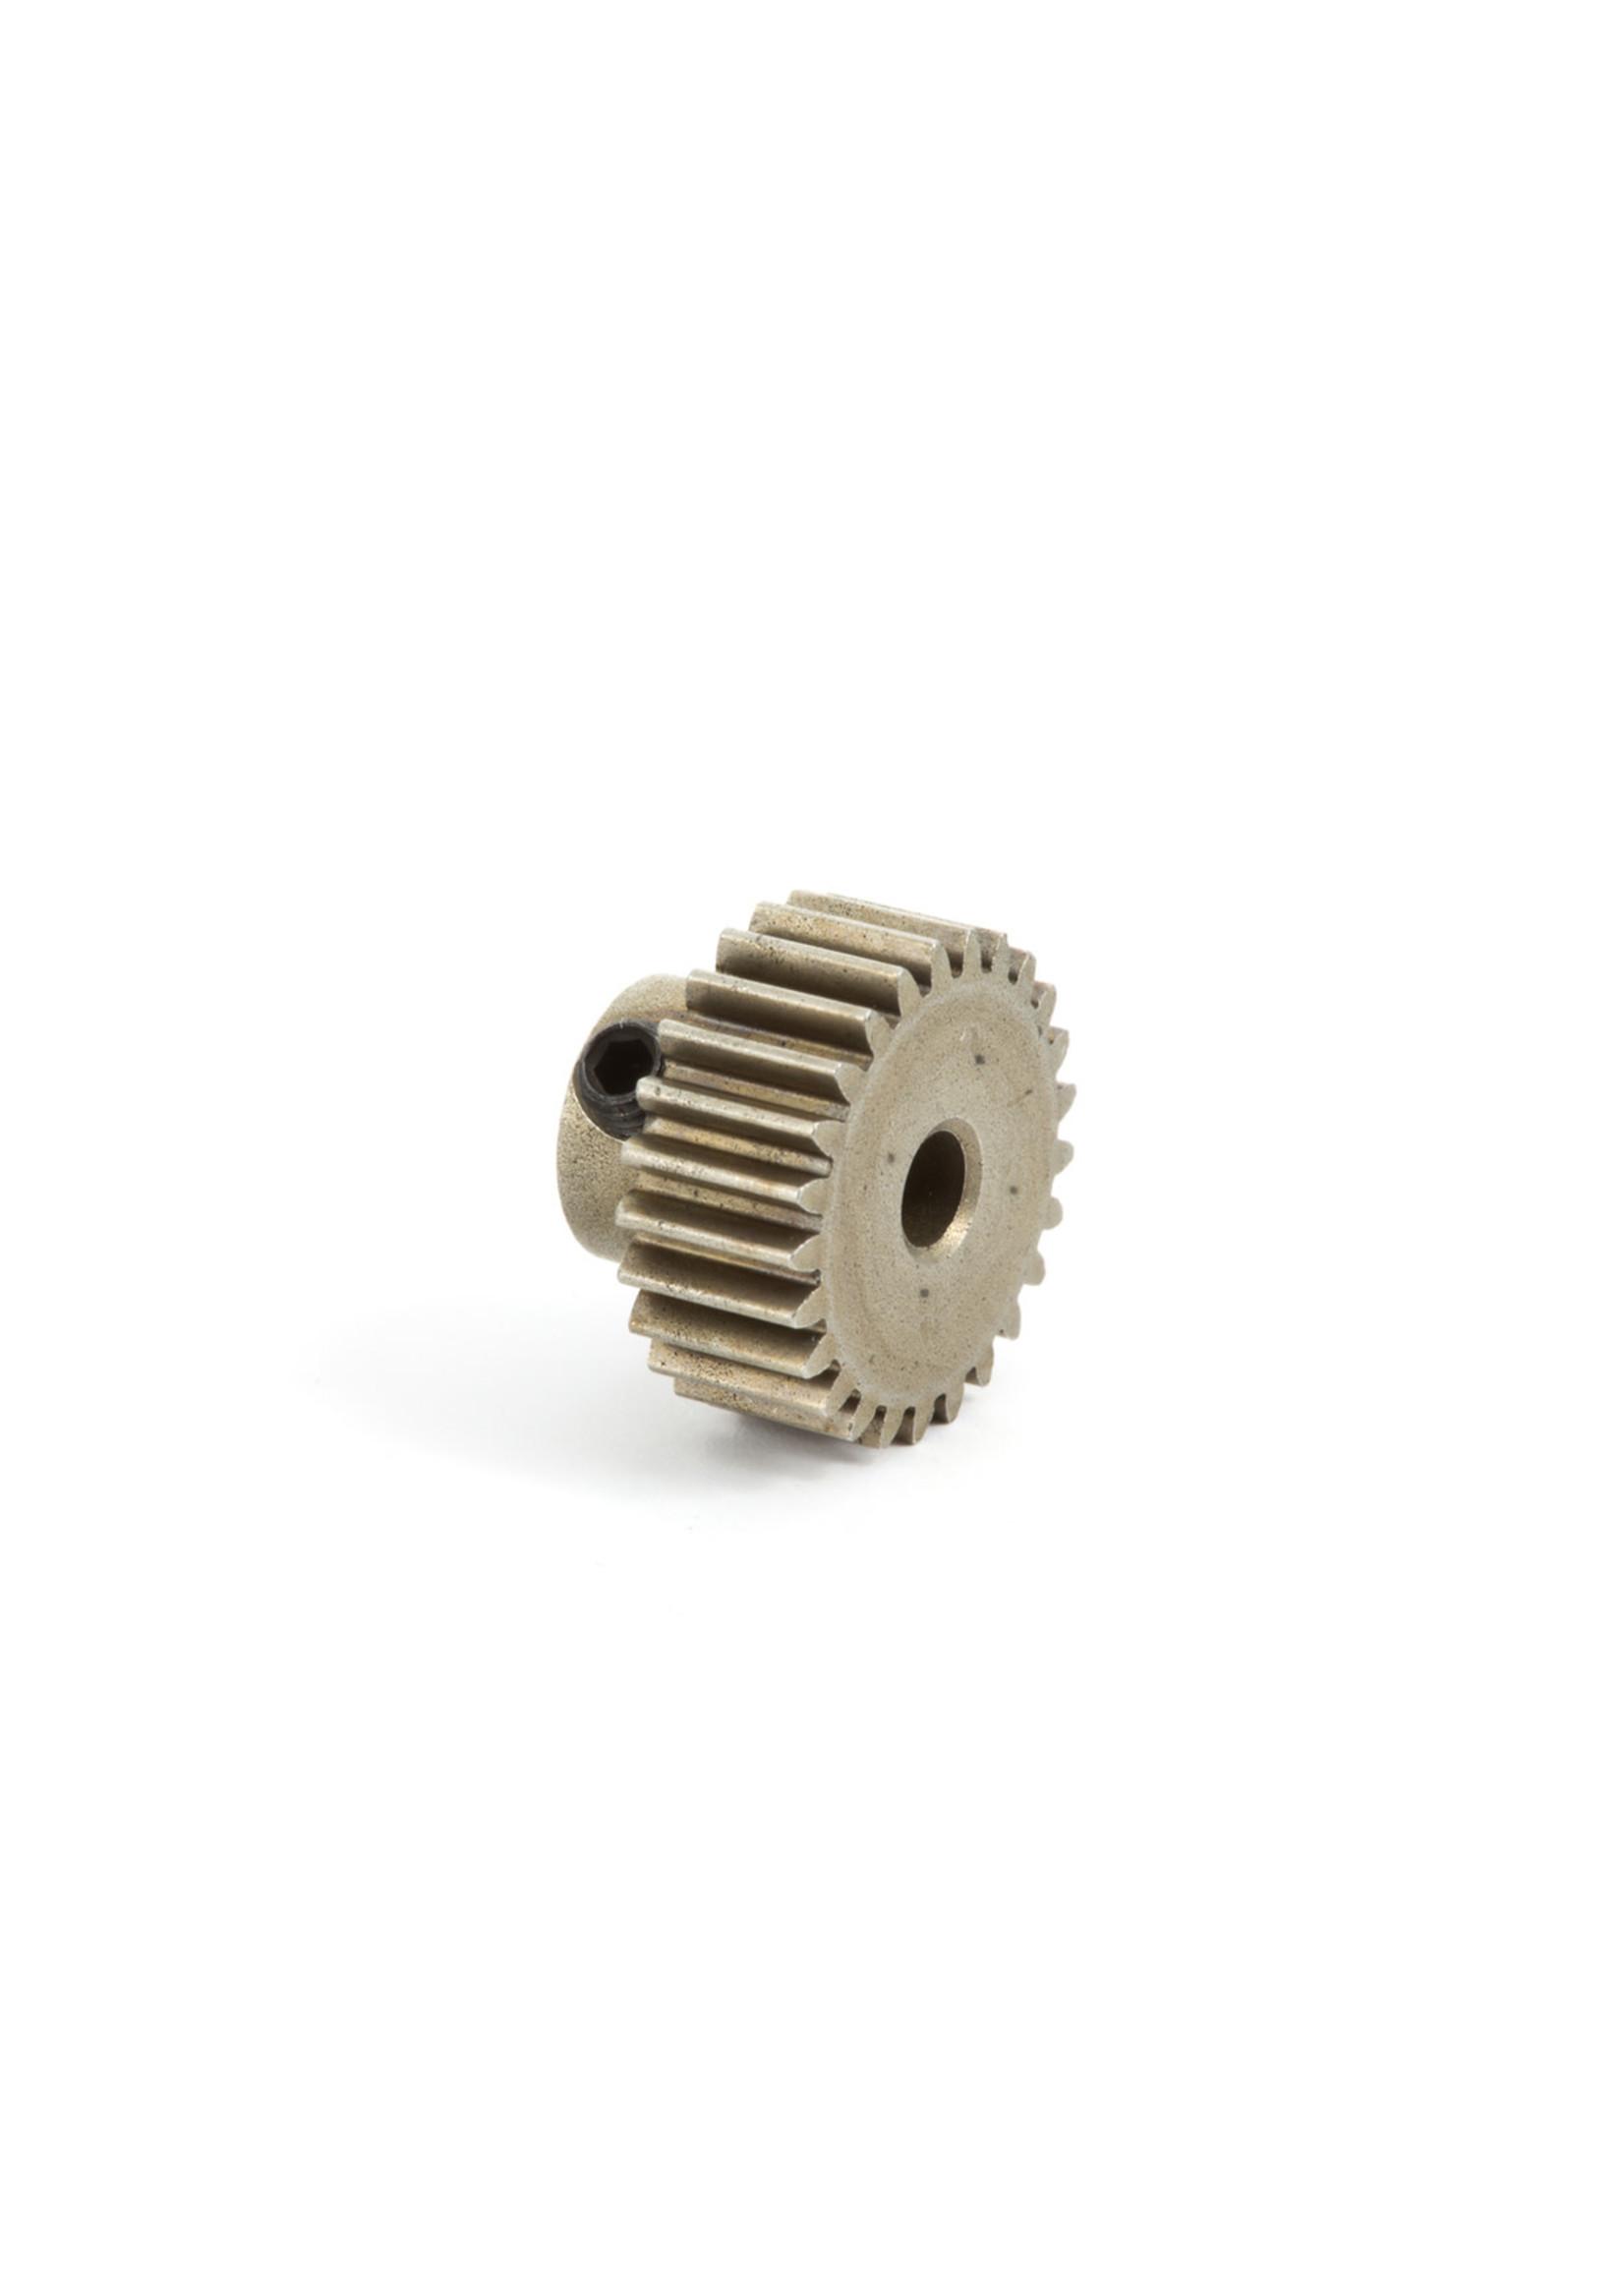 ARRMA AR310374 Arrma Pinion Gear 48P 25T